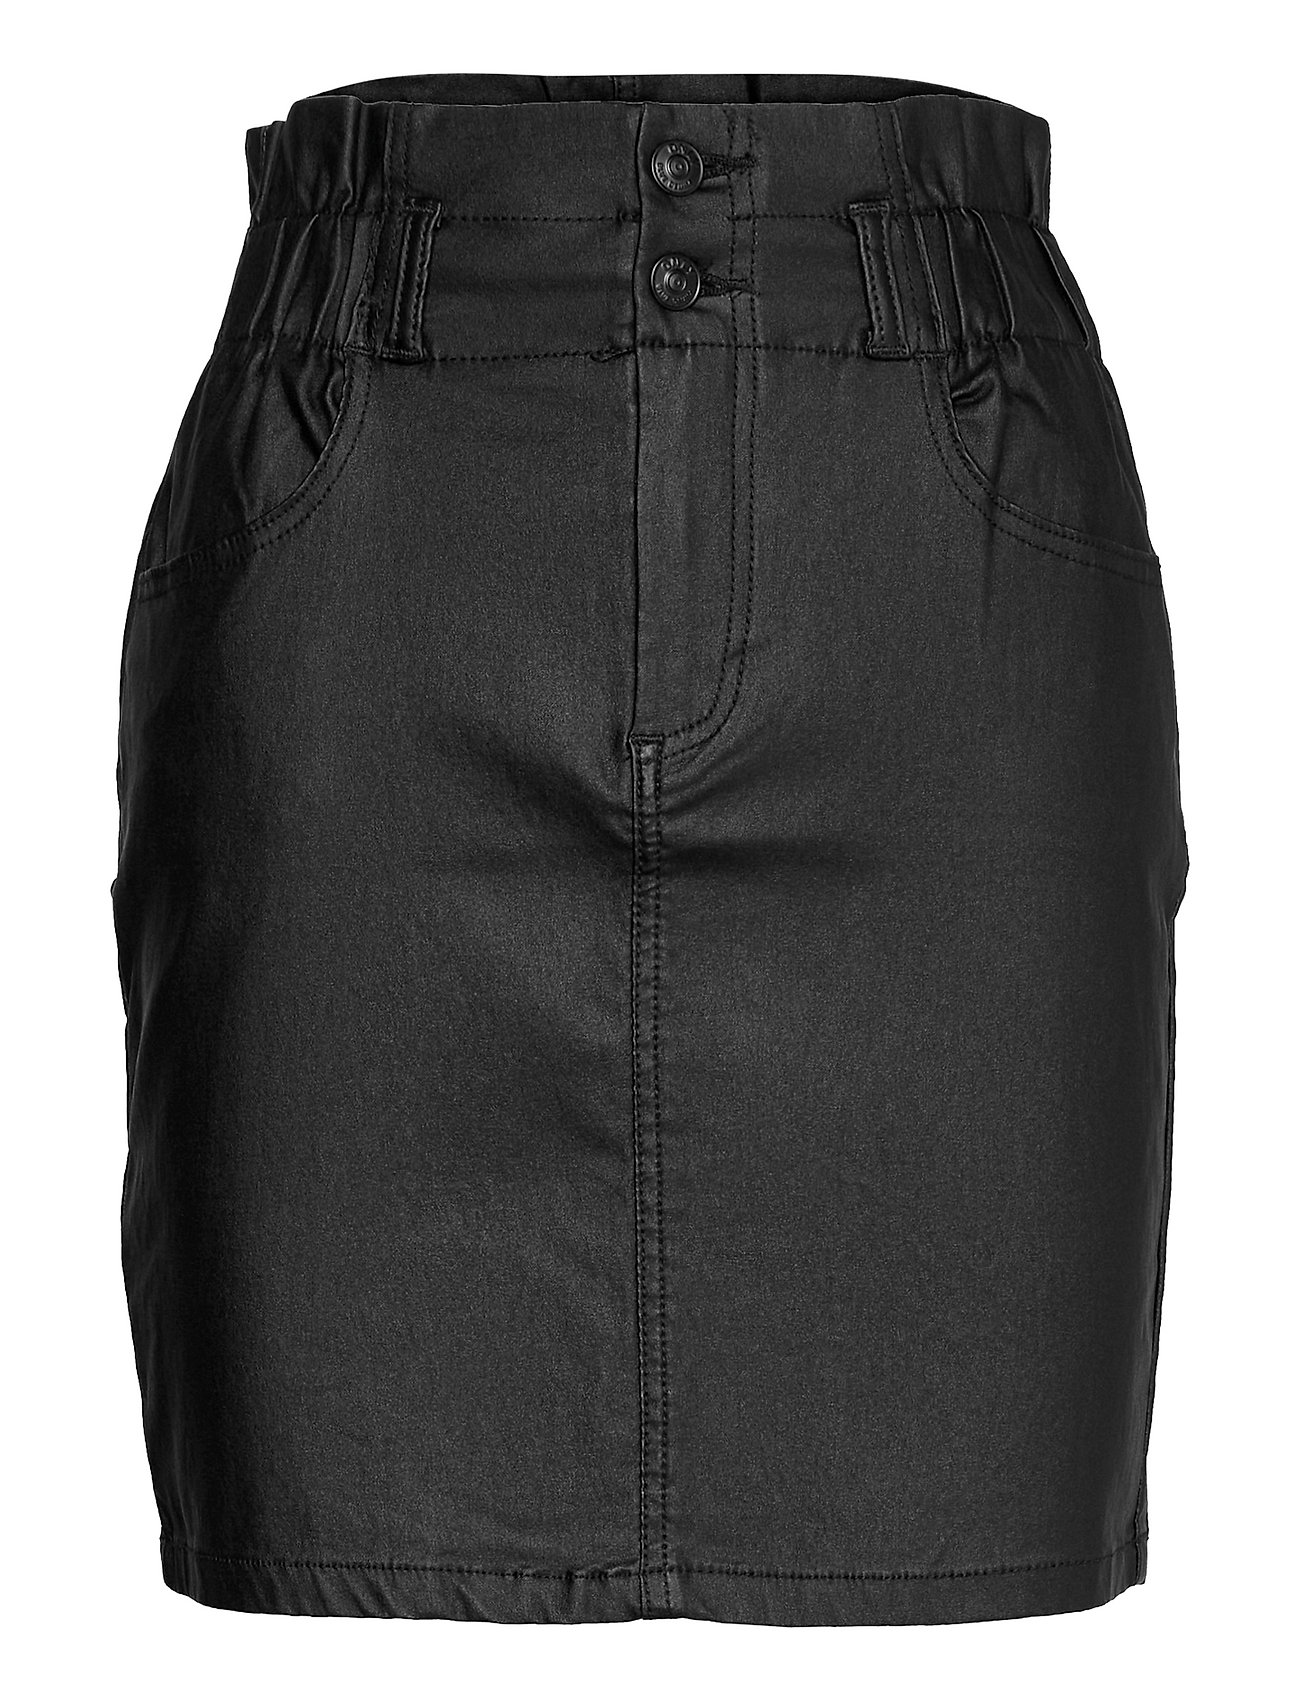 Onlmillie-Nya Pb Coated Skirt Cc Pnt Kort Nederdel Sort ONLY